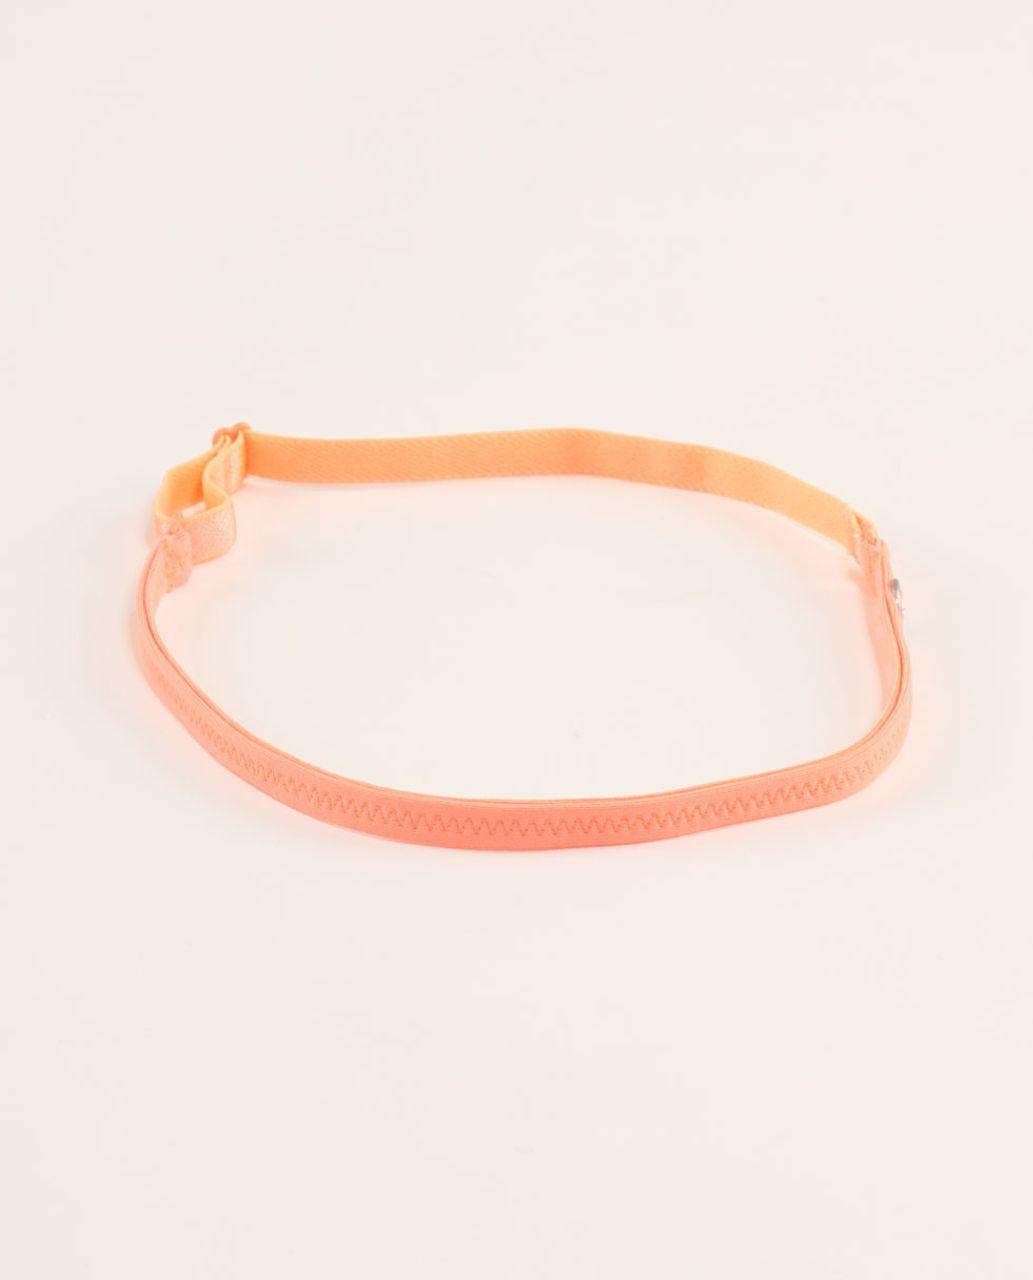 Lululemon Strappy Headband - Pop Orange